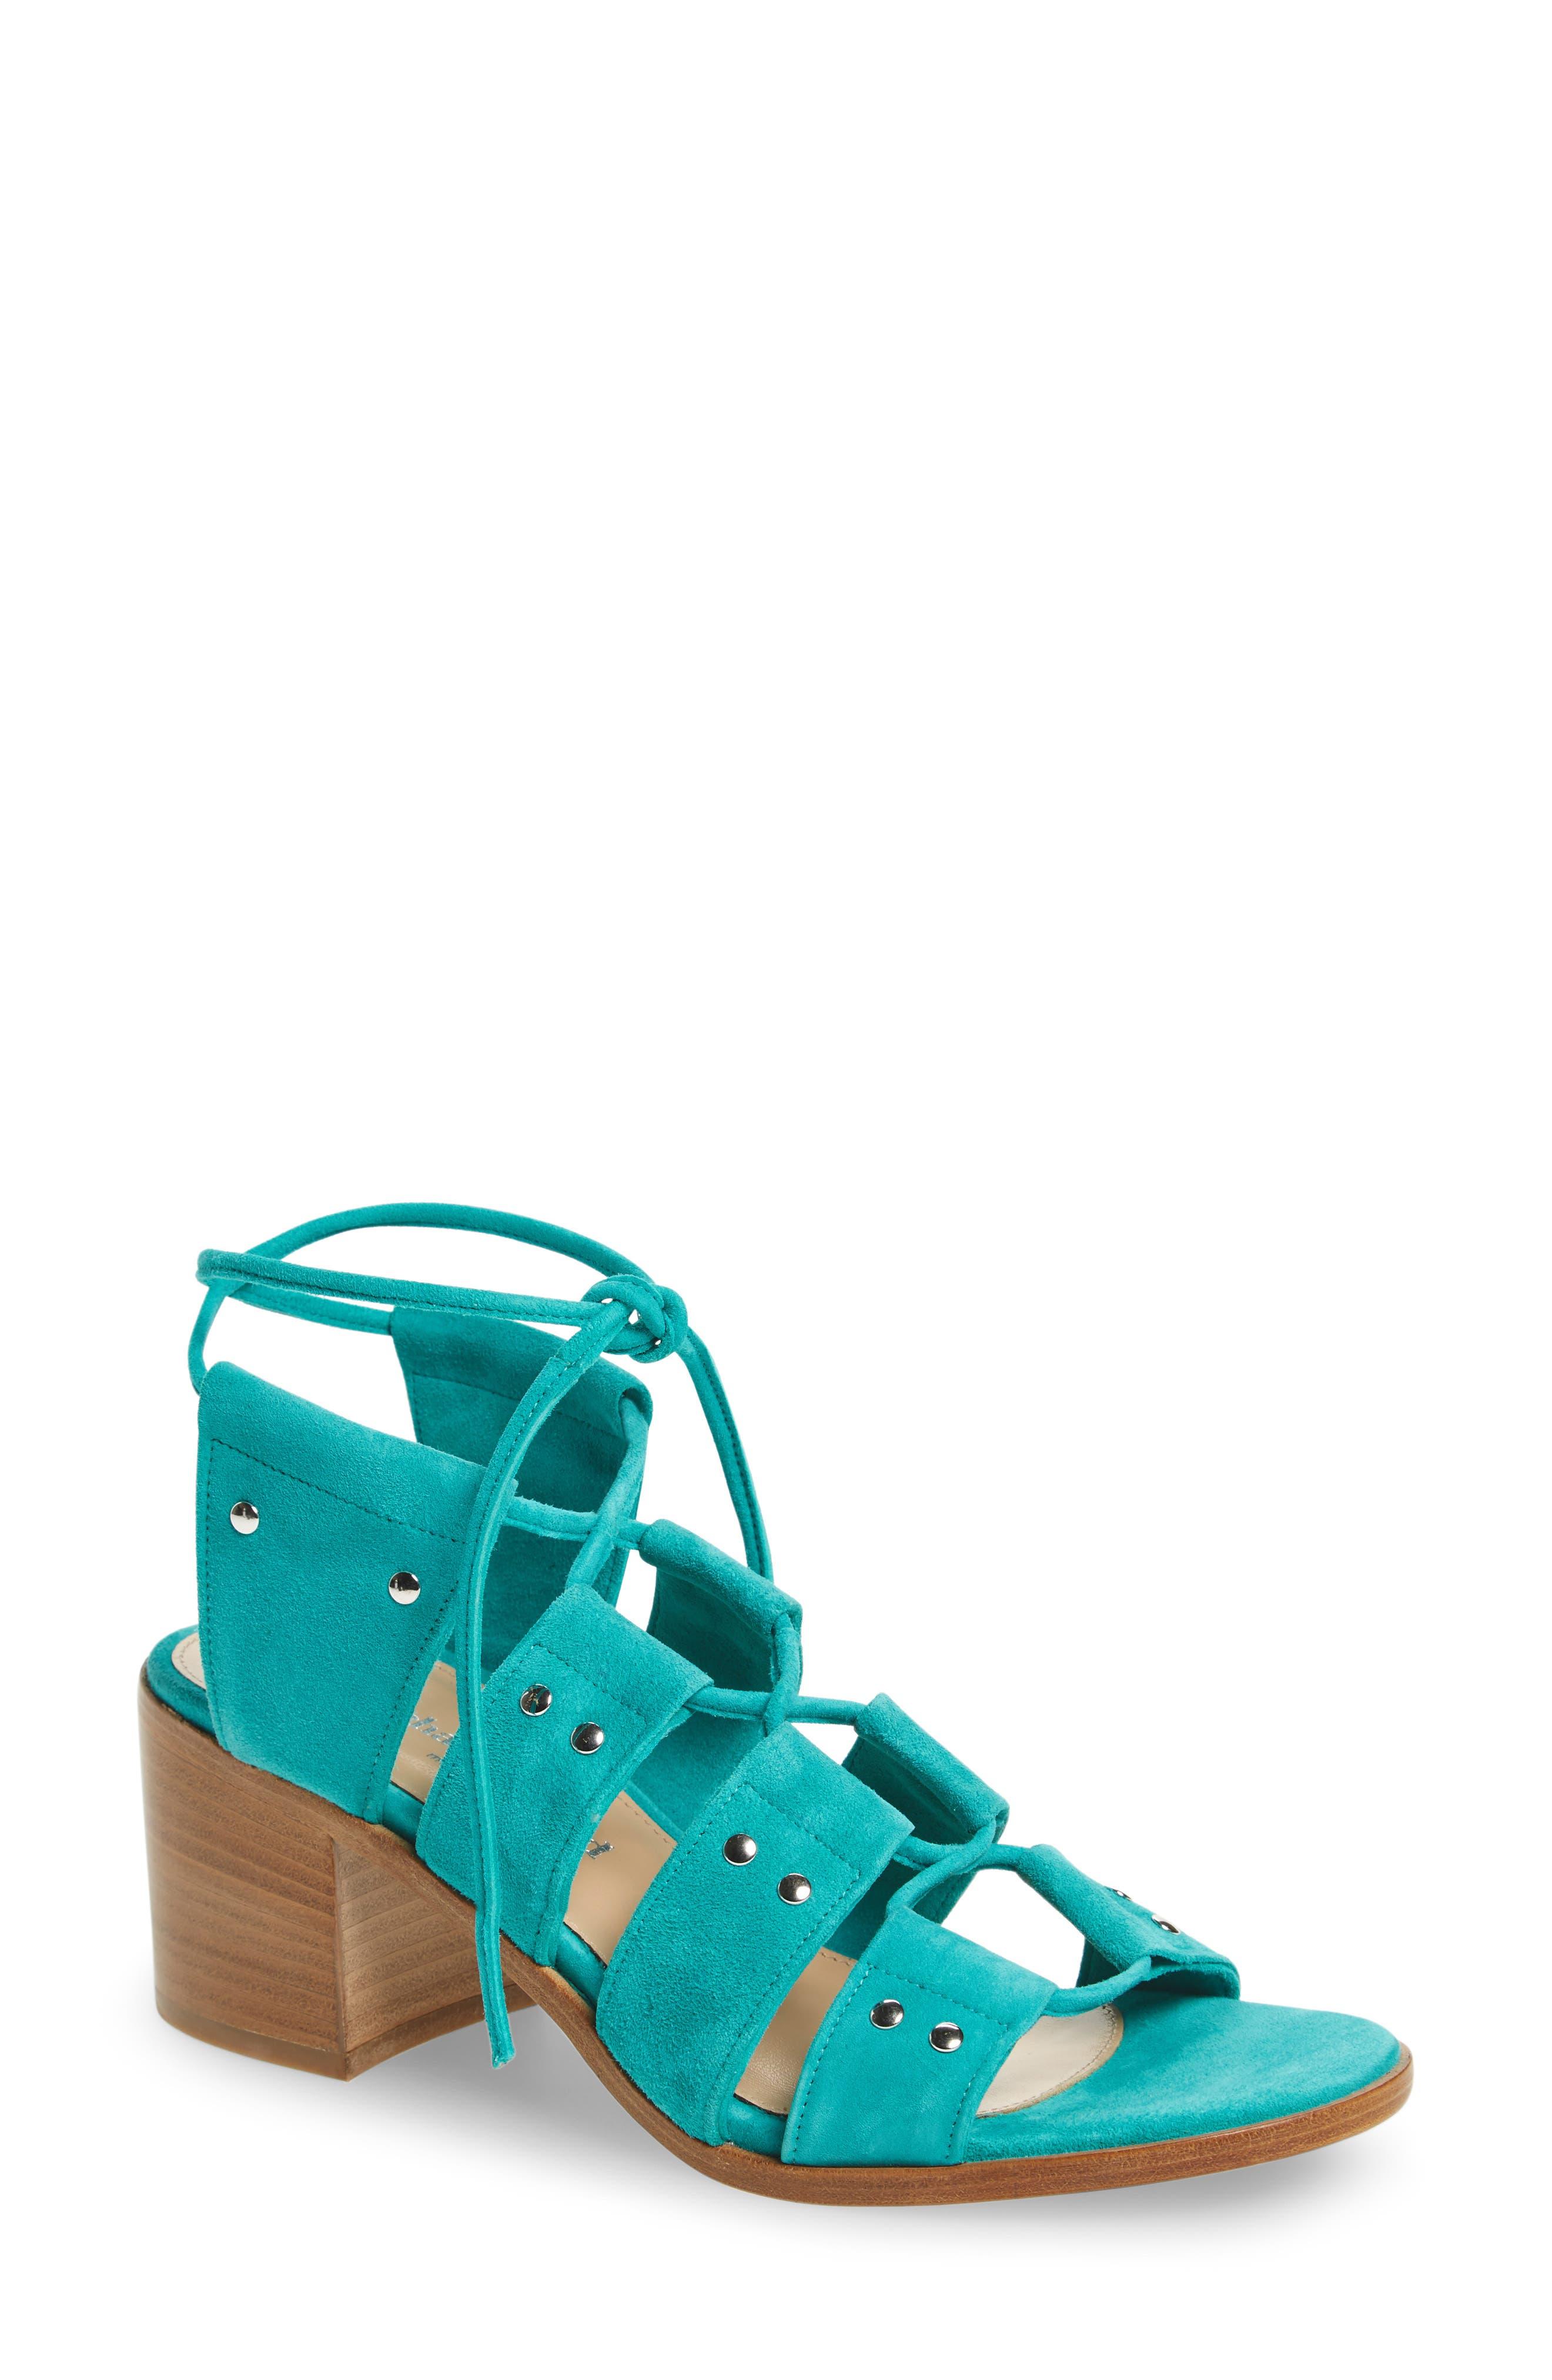 Birch Block Heel Sandal,                             Main thumbnail 3, color,